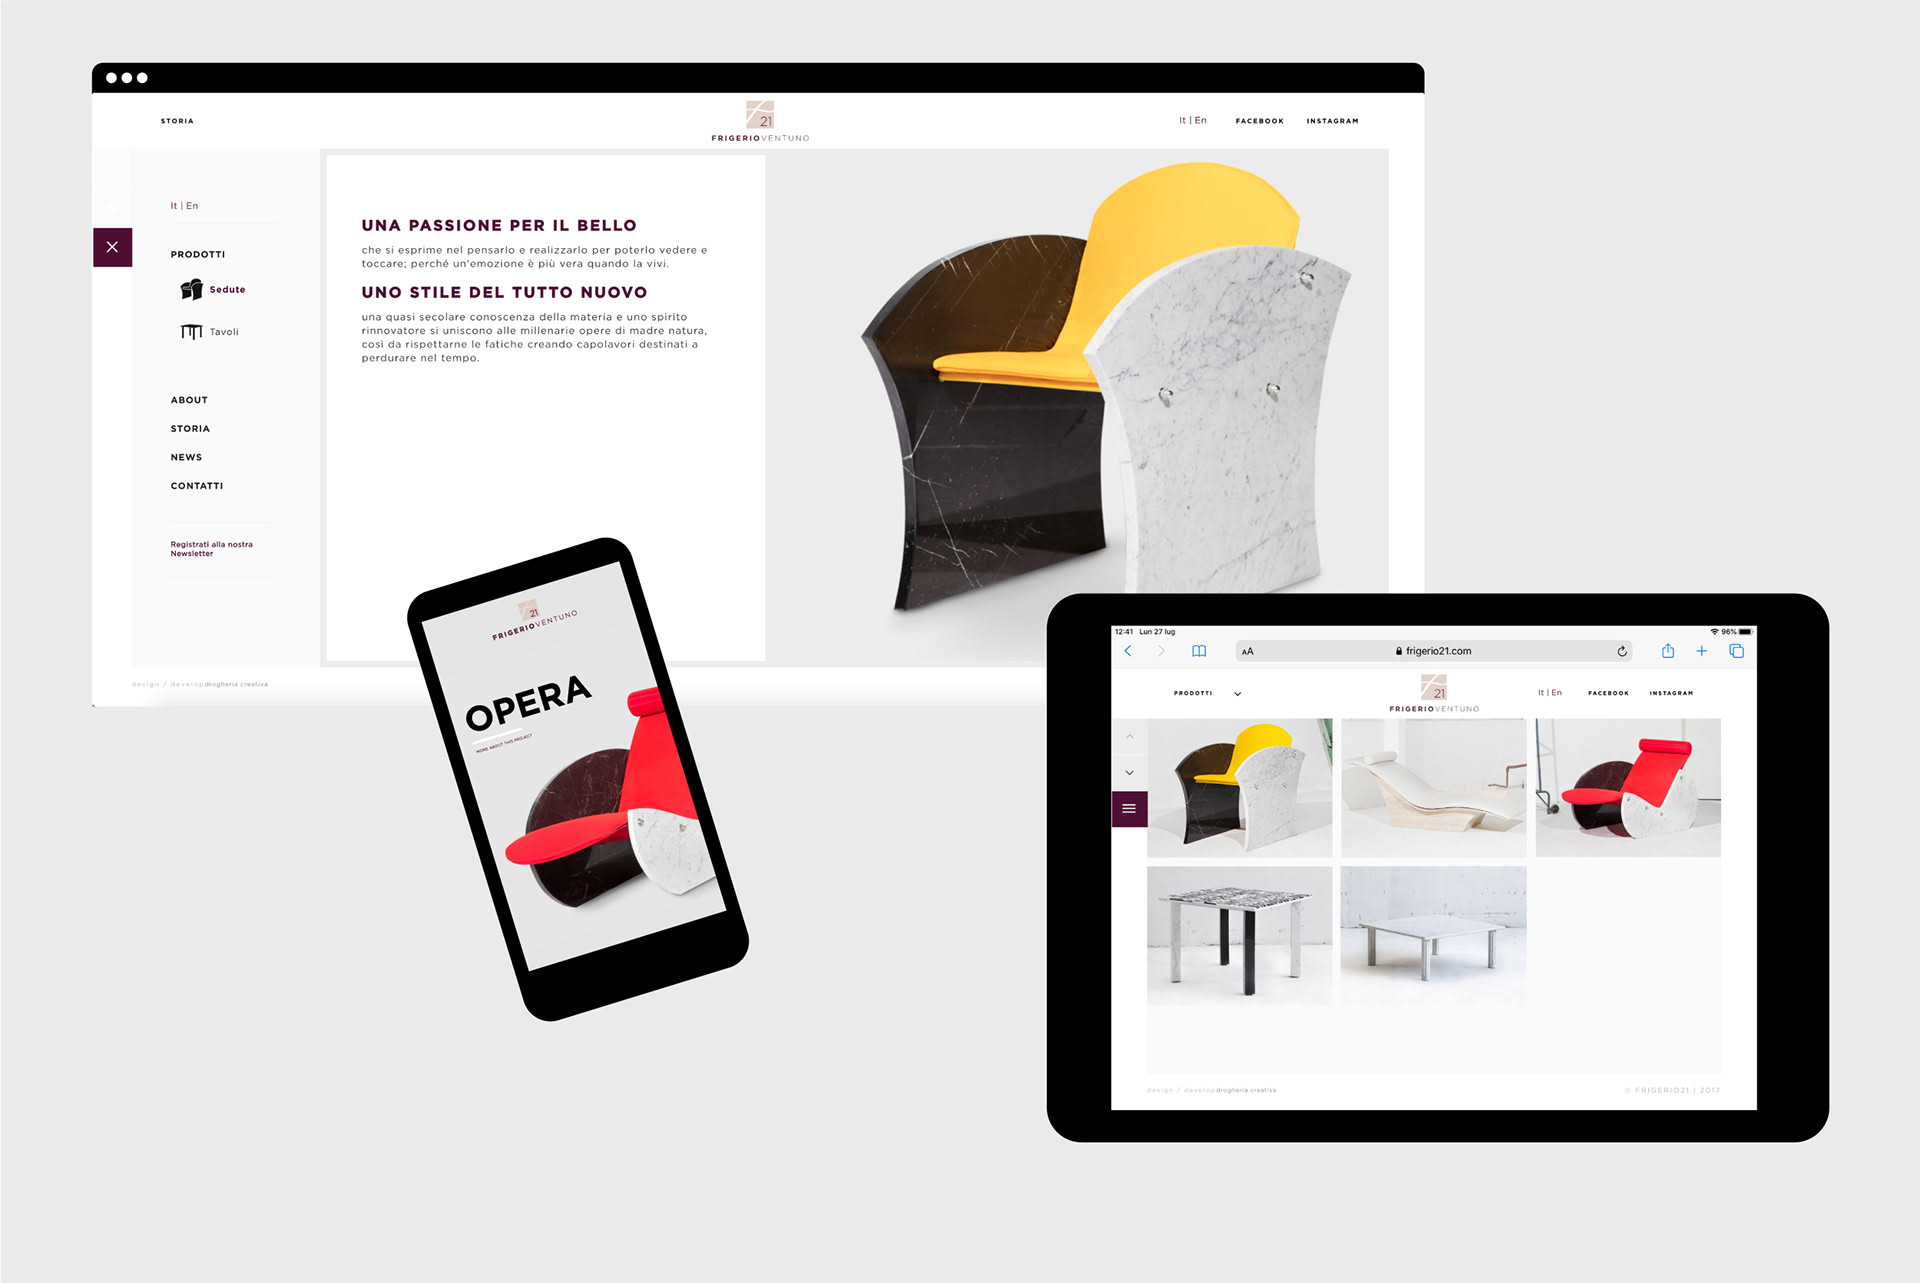 webdesign_frigerio_21_marble_design_graphic_design_studio_milano_drogheria_studio_yellow